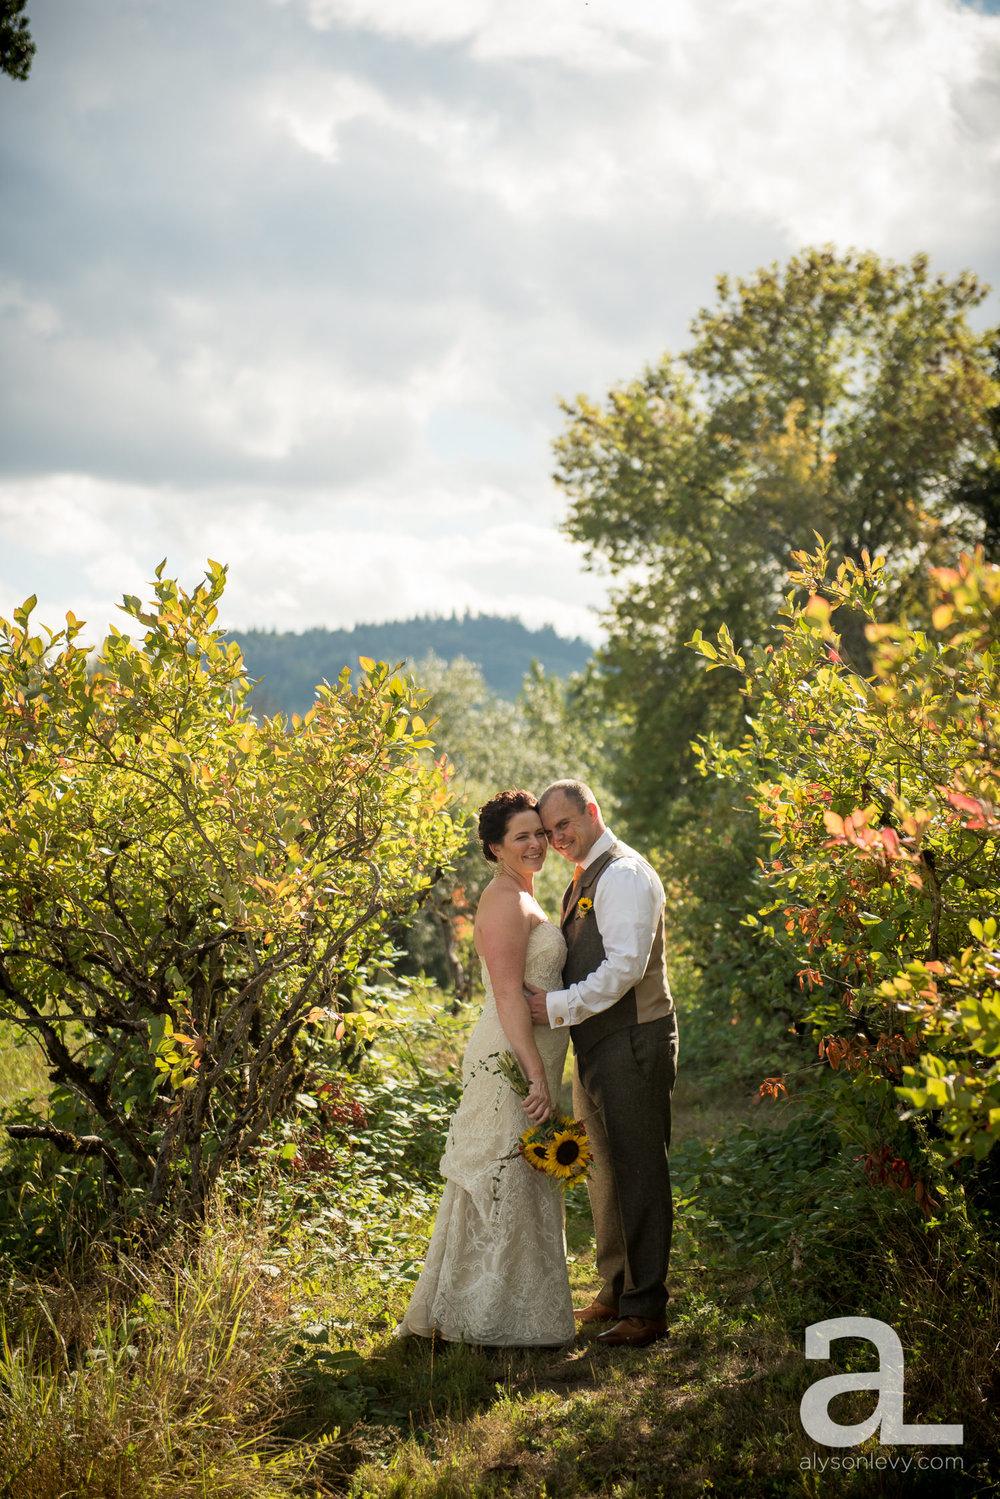 Krugers-Farm-Sauvie-Island-Wedding-Photography-008.jpg